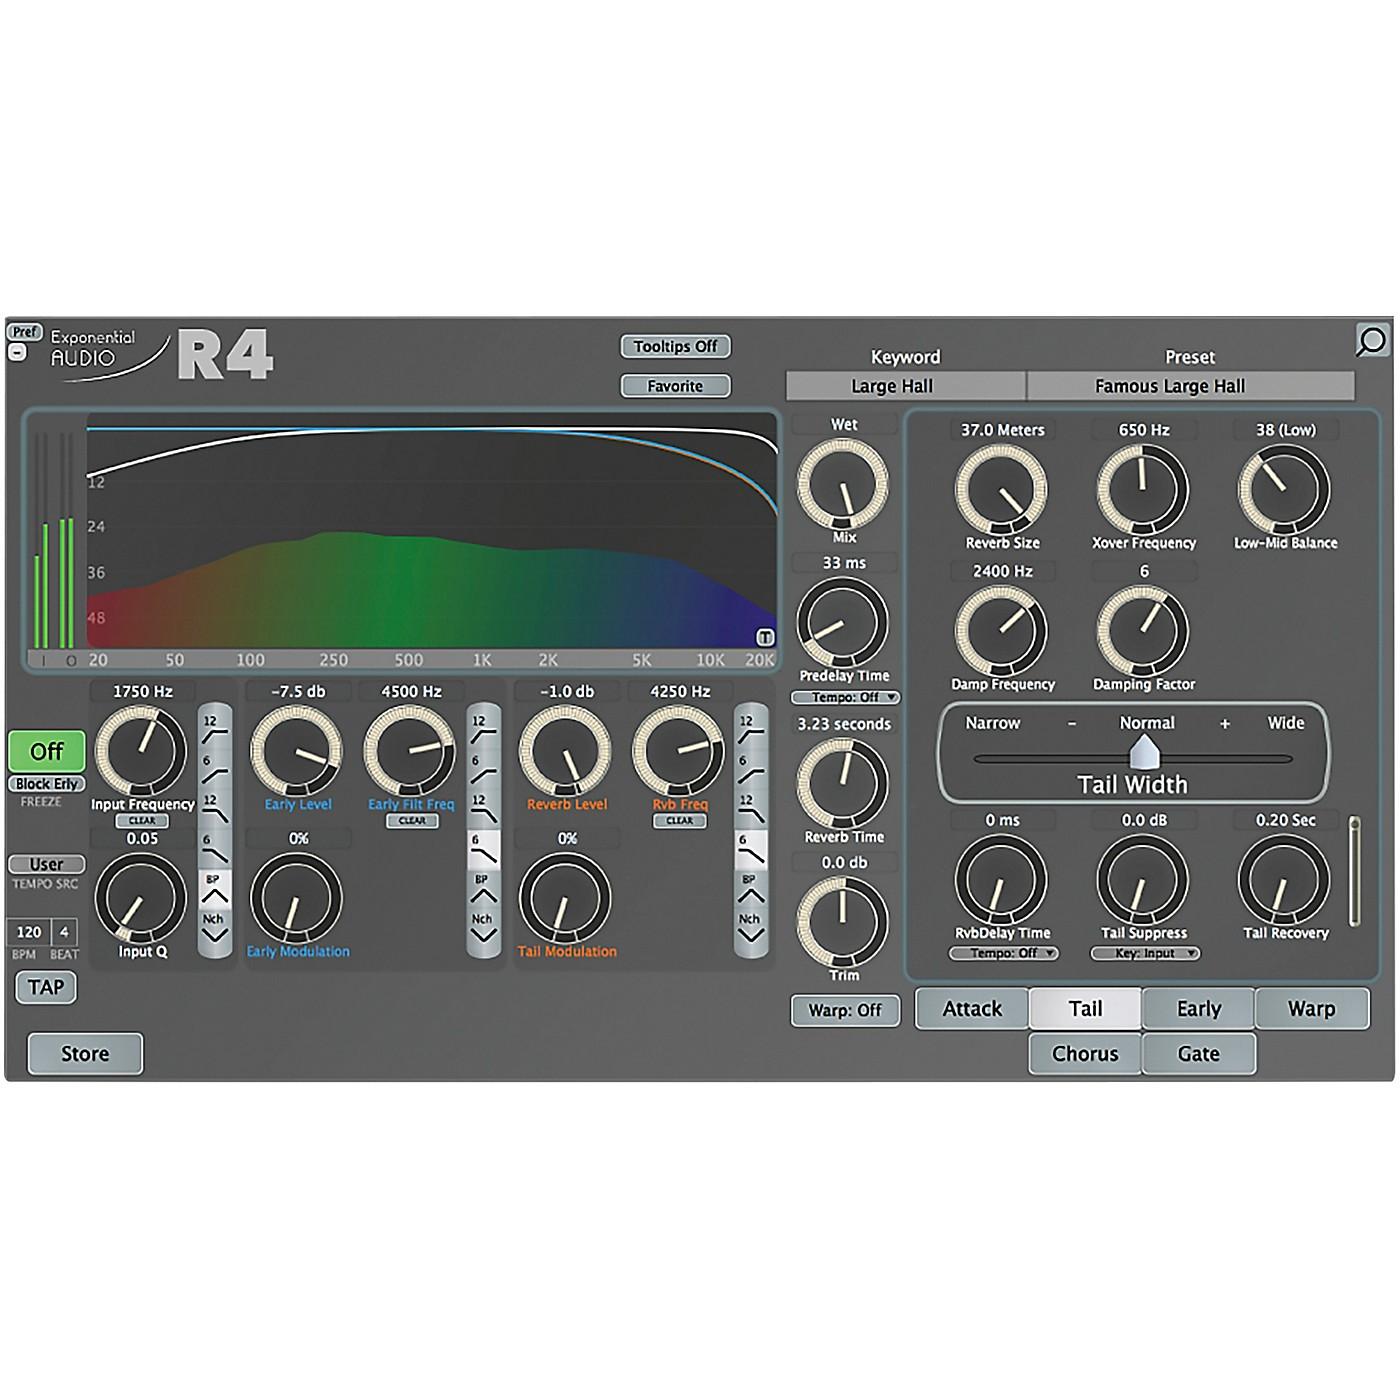 Exponential Audio R4 thumbnail